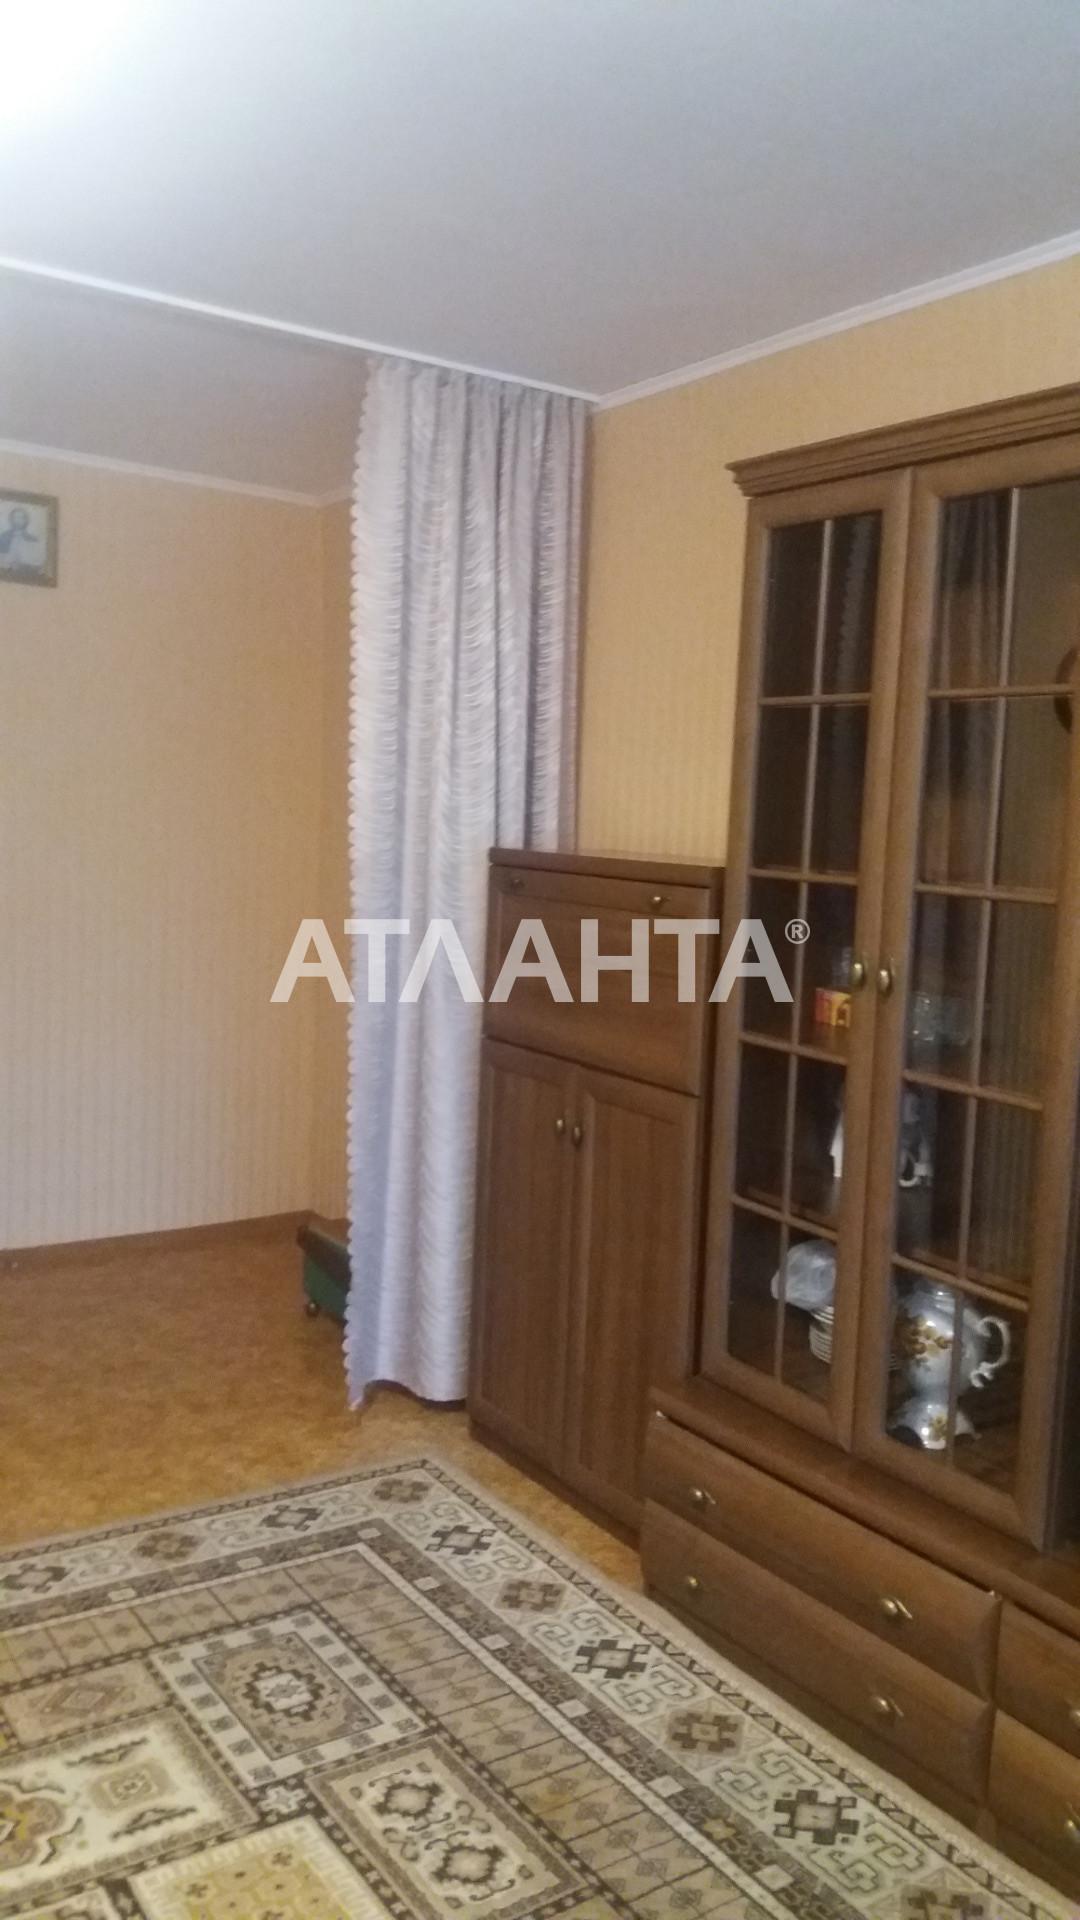 Продается 1-комнатная Квартира на ул. Александрийская — 29 000 у.е. (фото №5)